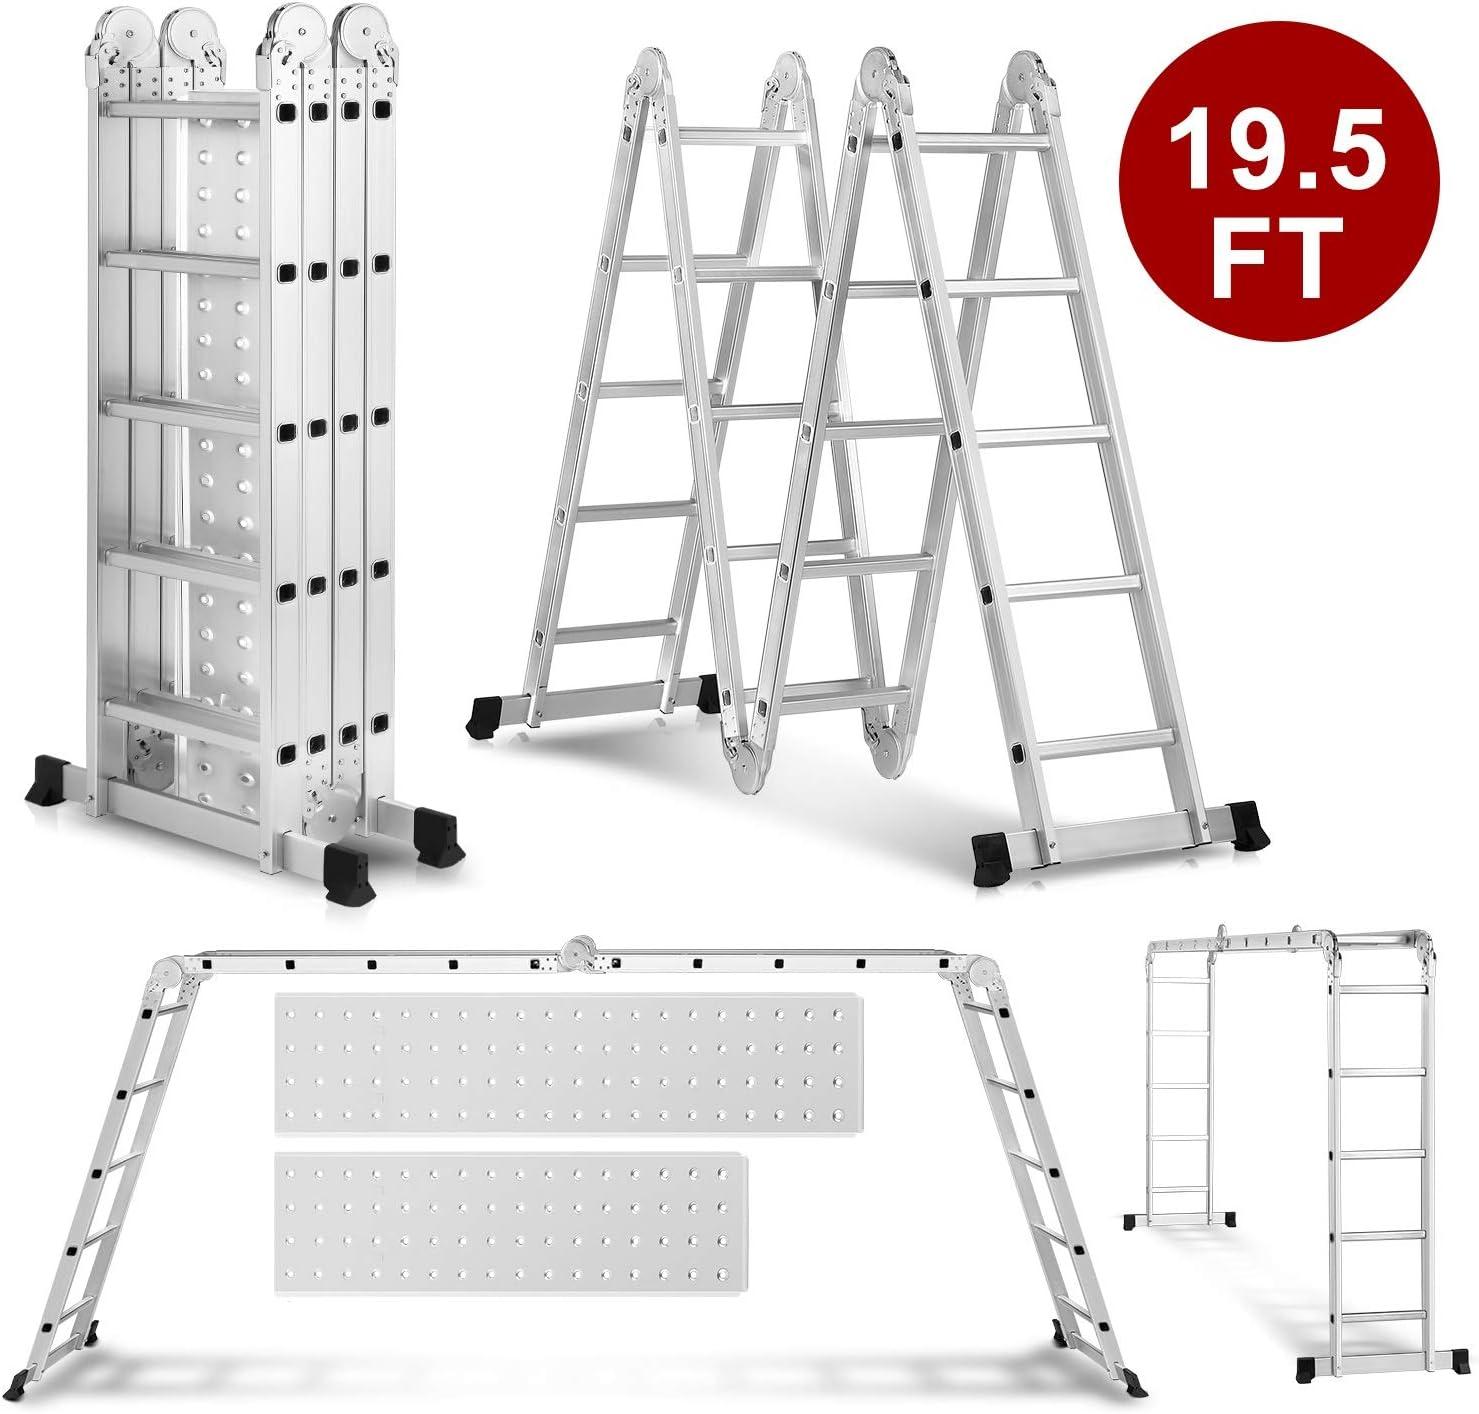 Idealchoiceproduct 19.5ft Heavy Duty Multi Purpose Folding Ladder